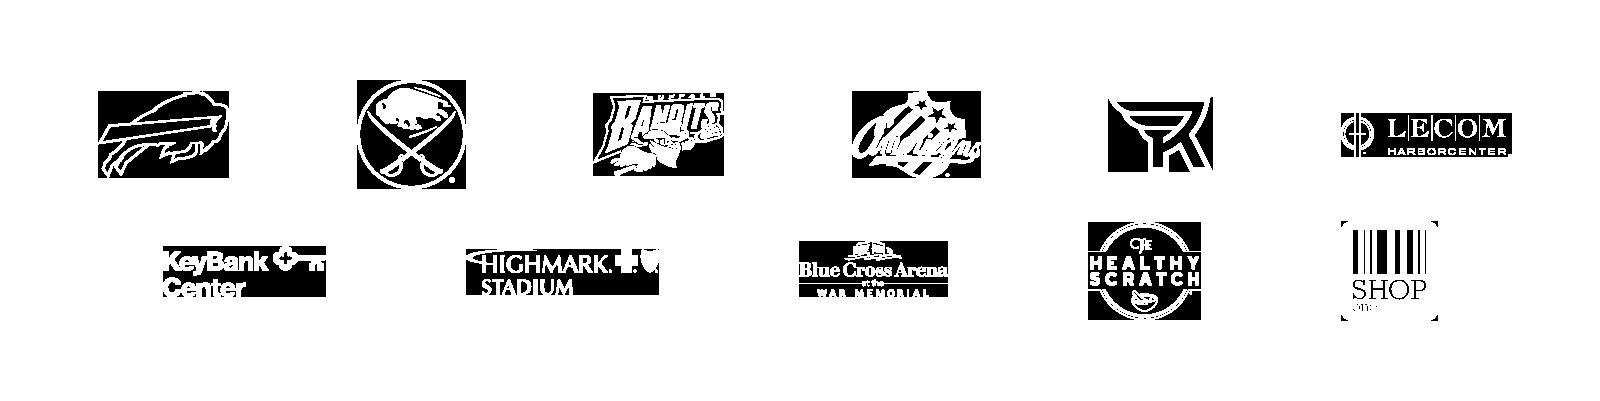 Teams, brands and properties